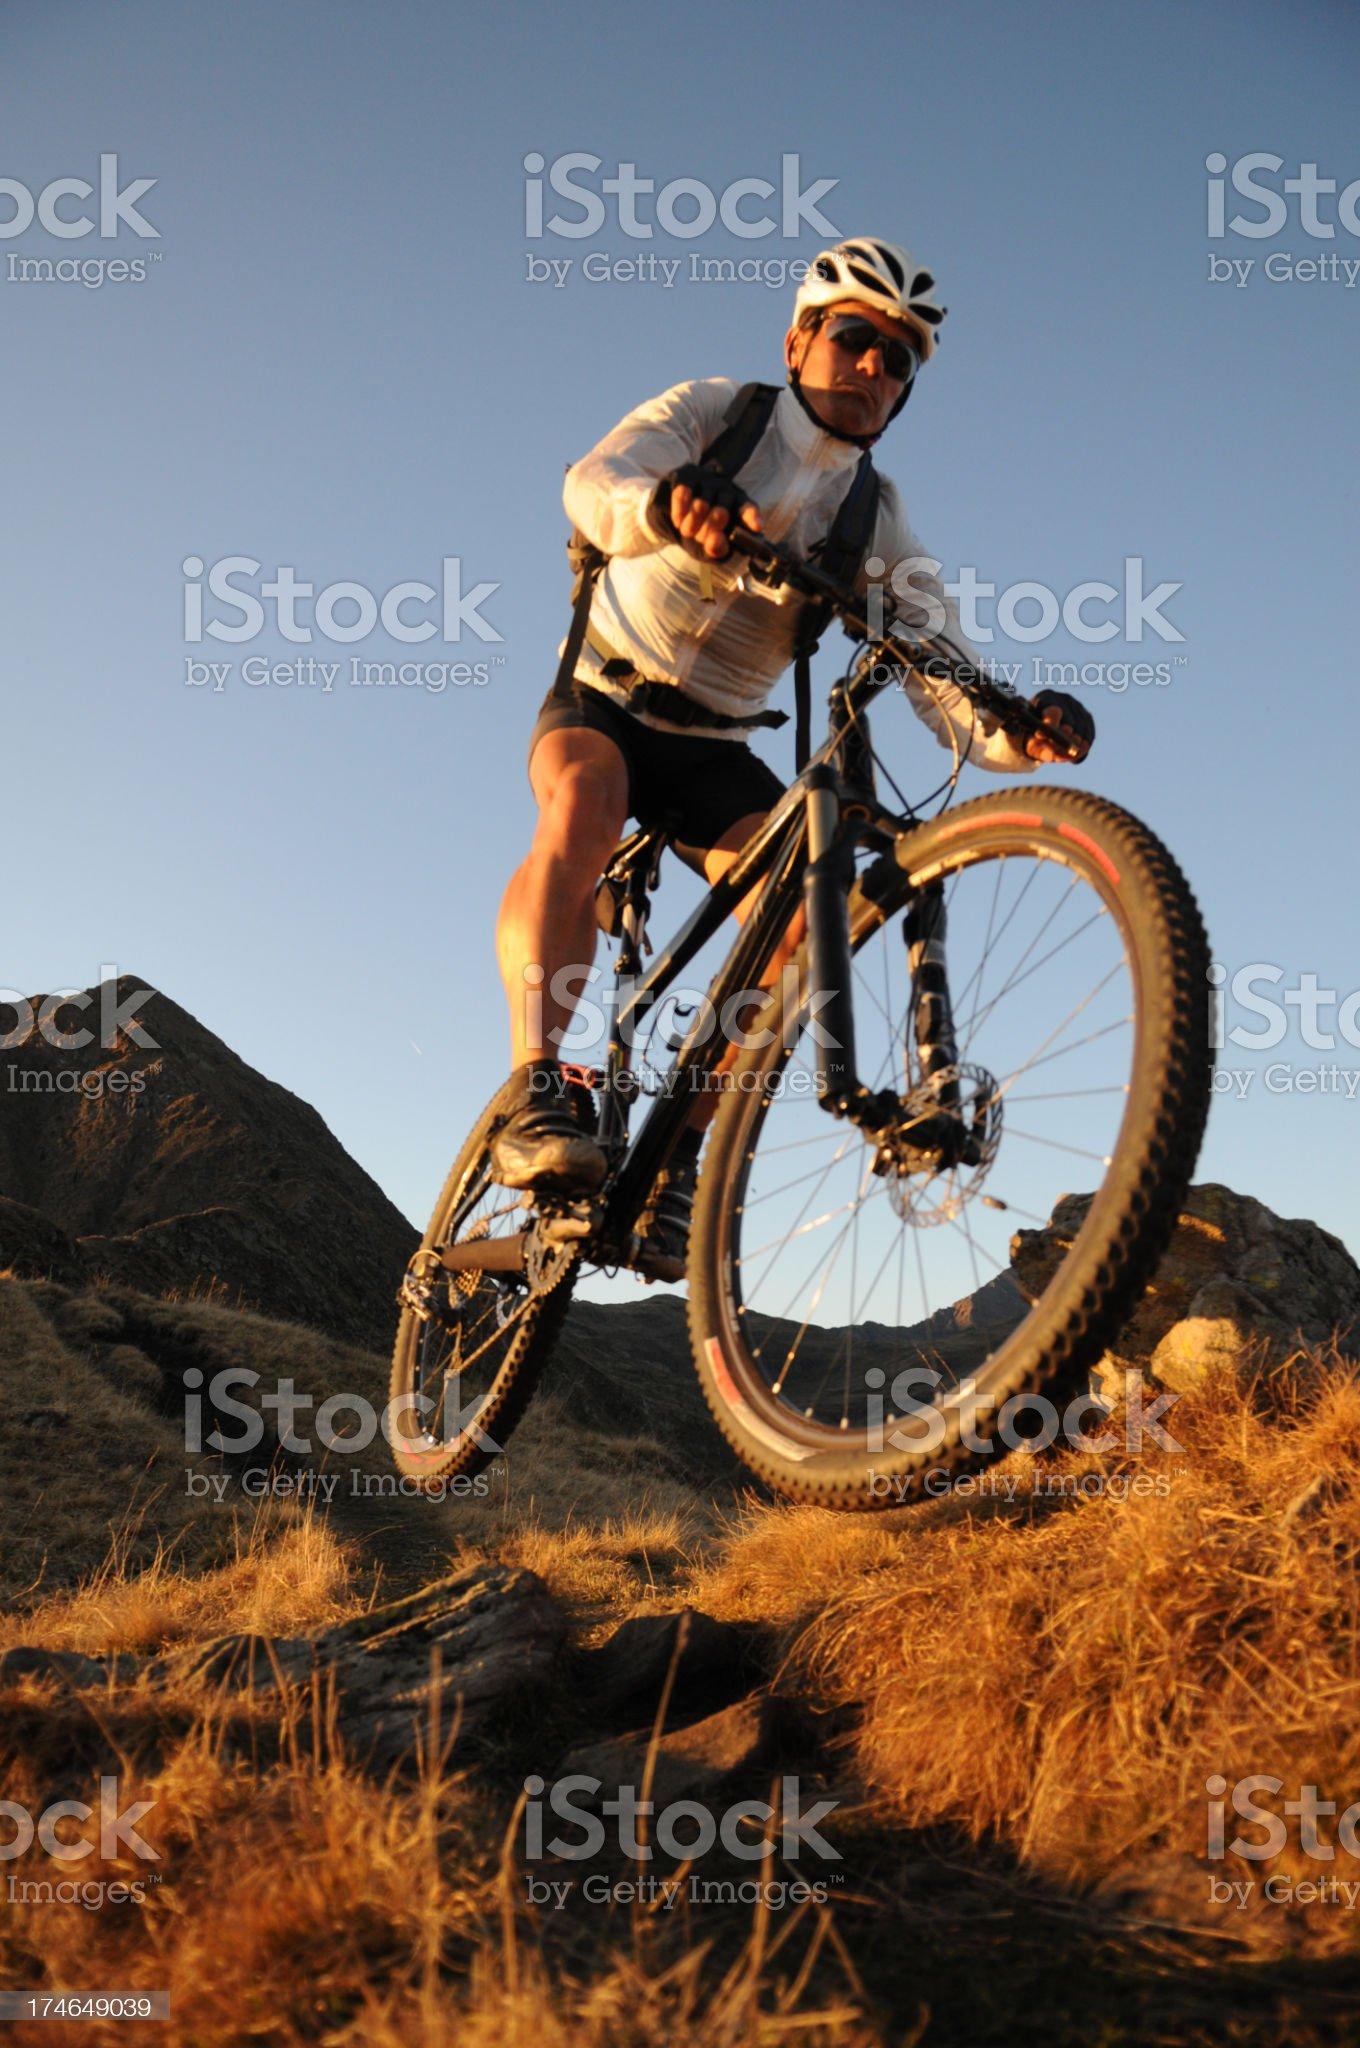 Mountainbike racer royalty-free stock photo